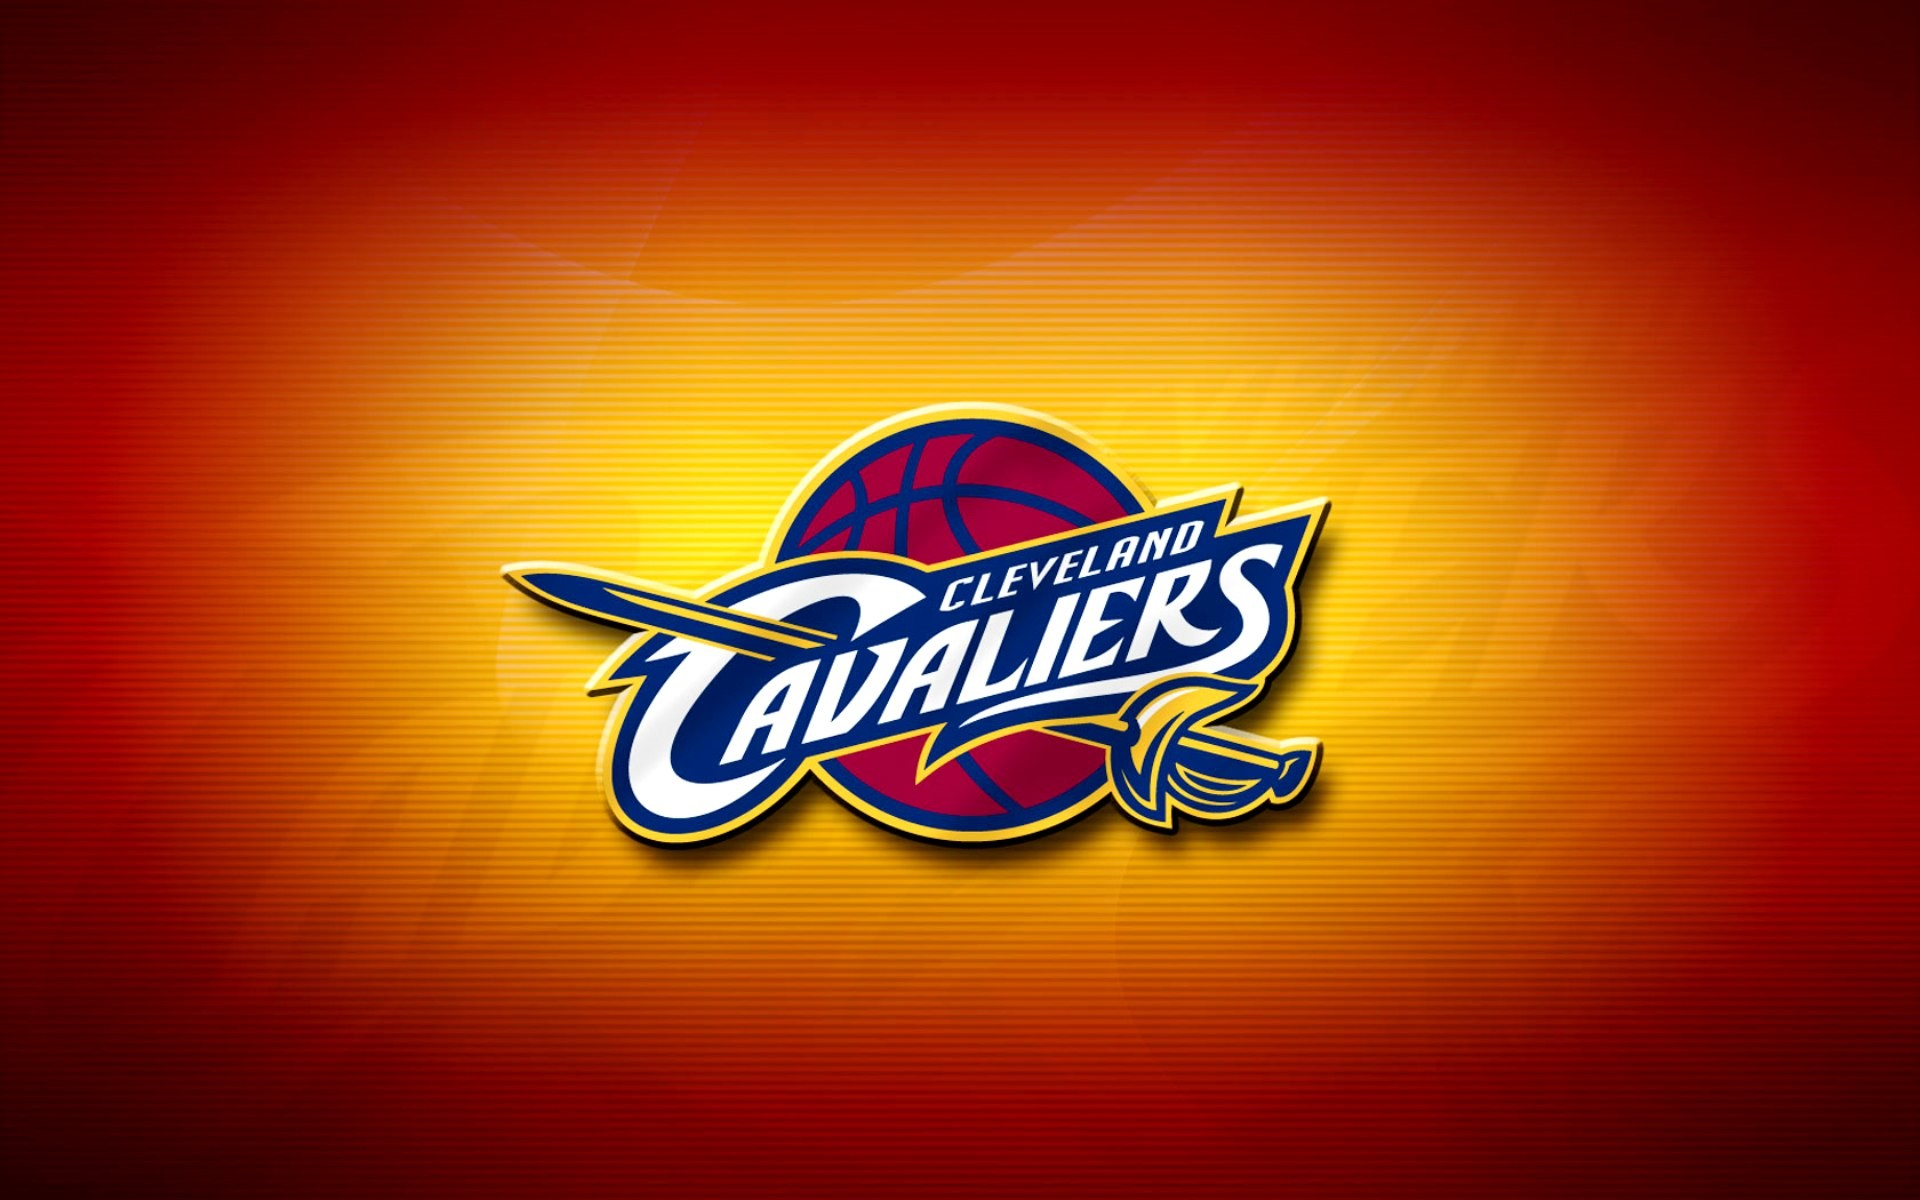 Cleveland Cavaliers Desktop Wallpaper Logo –  https://footywallpapershd.com/cleveland-